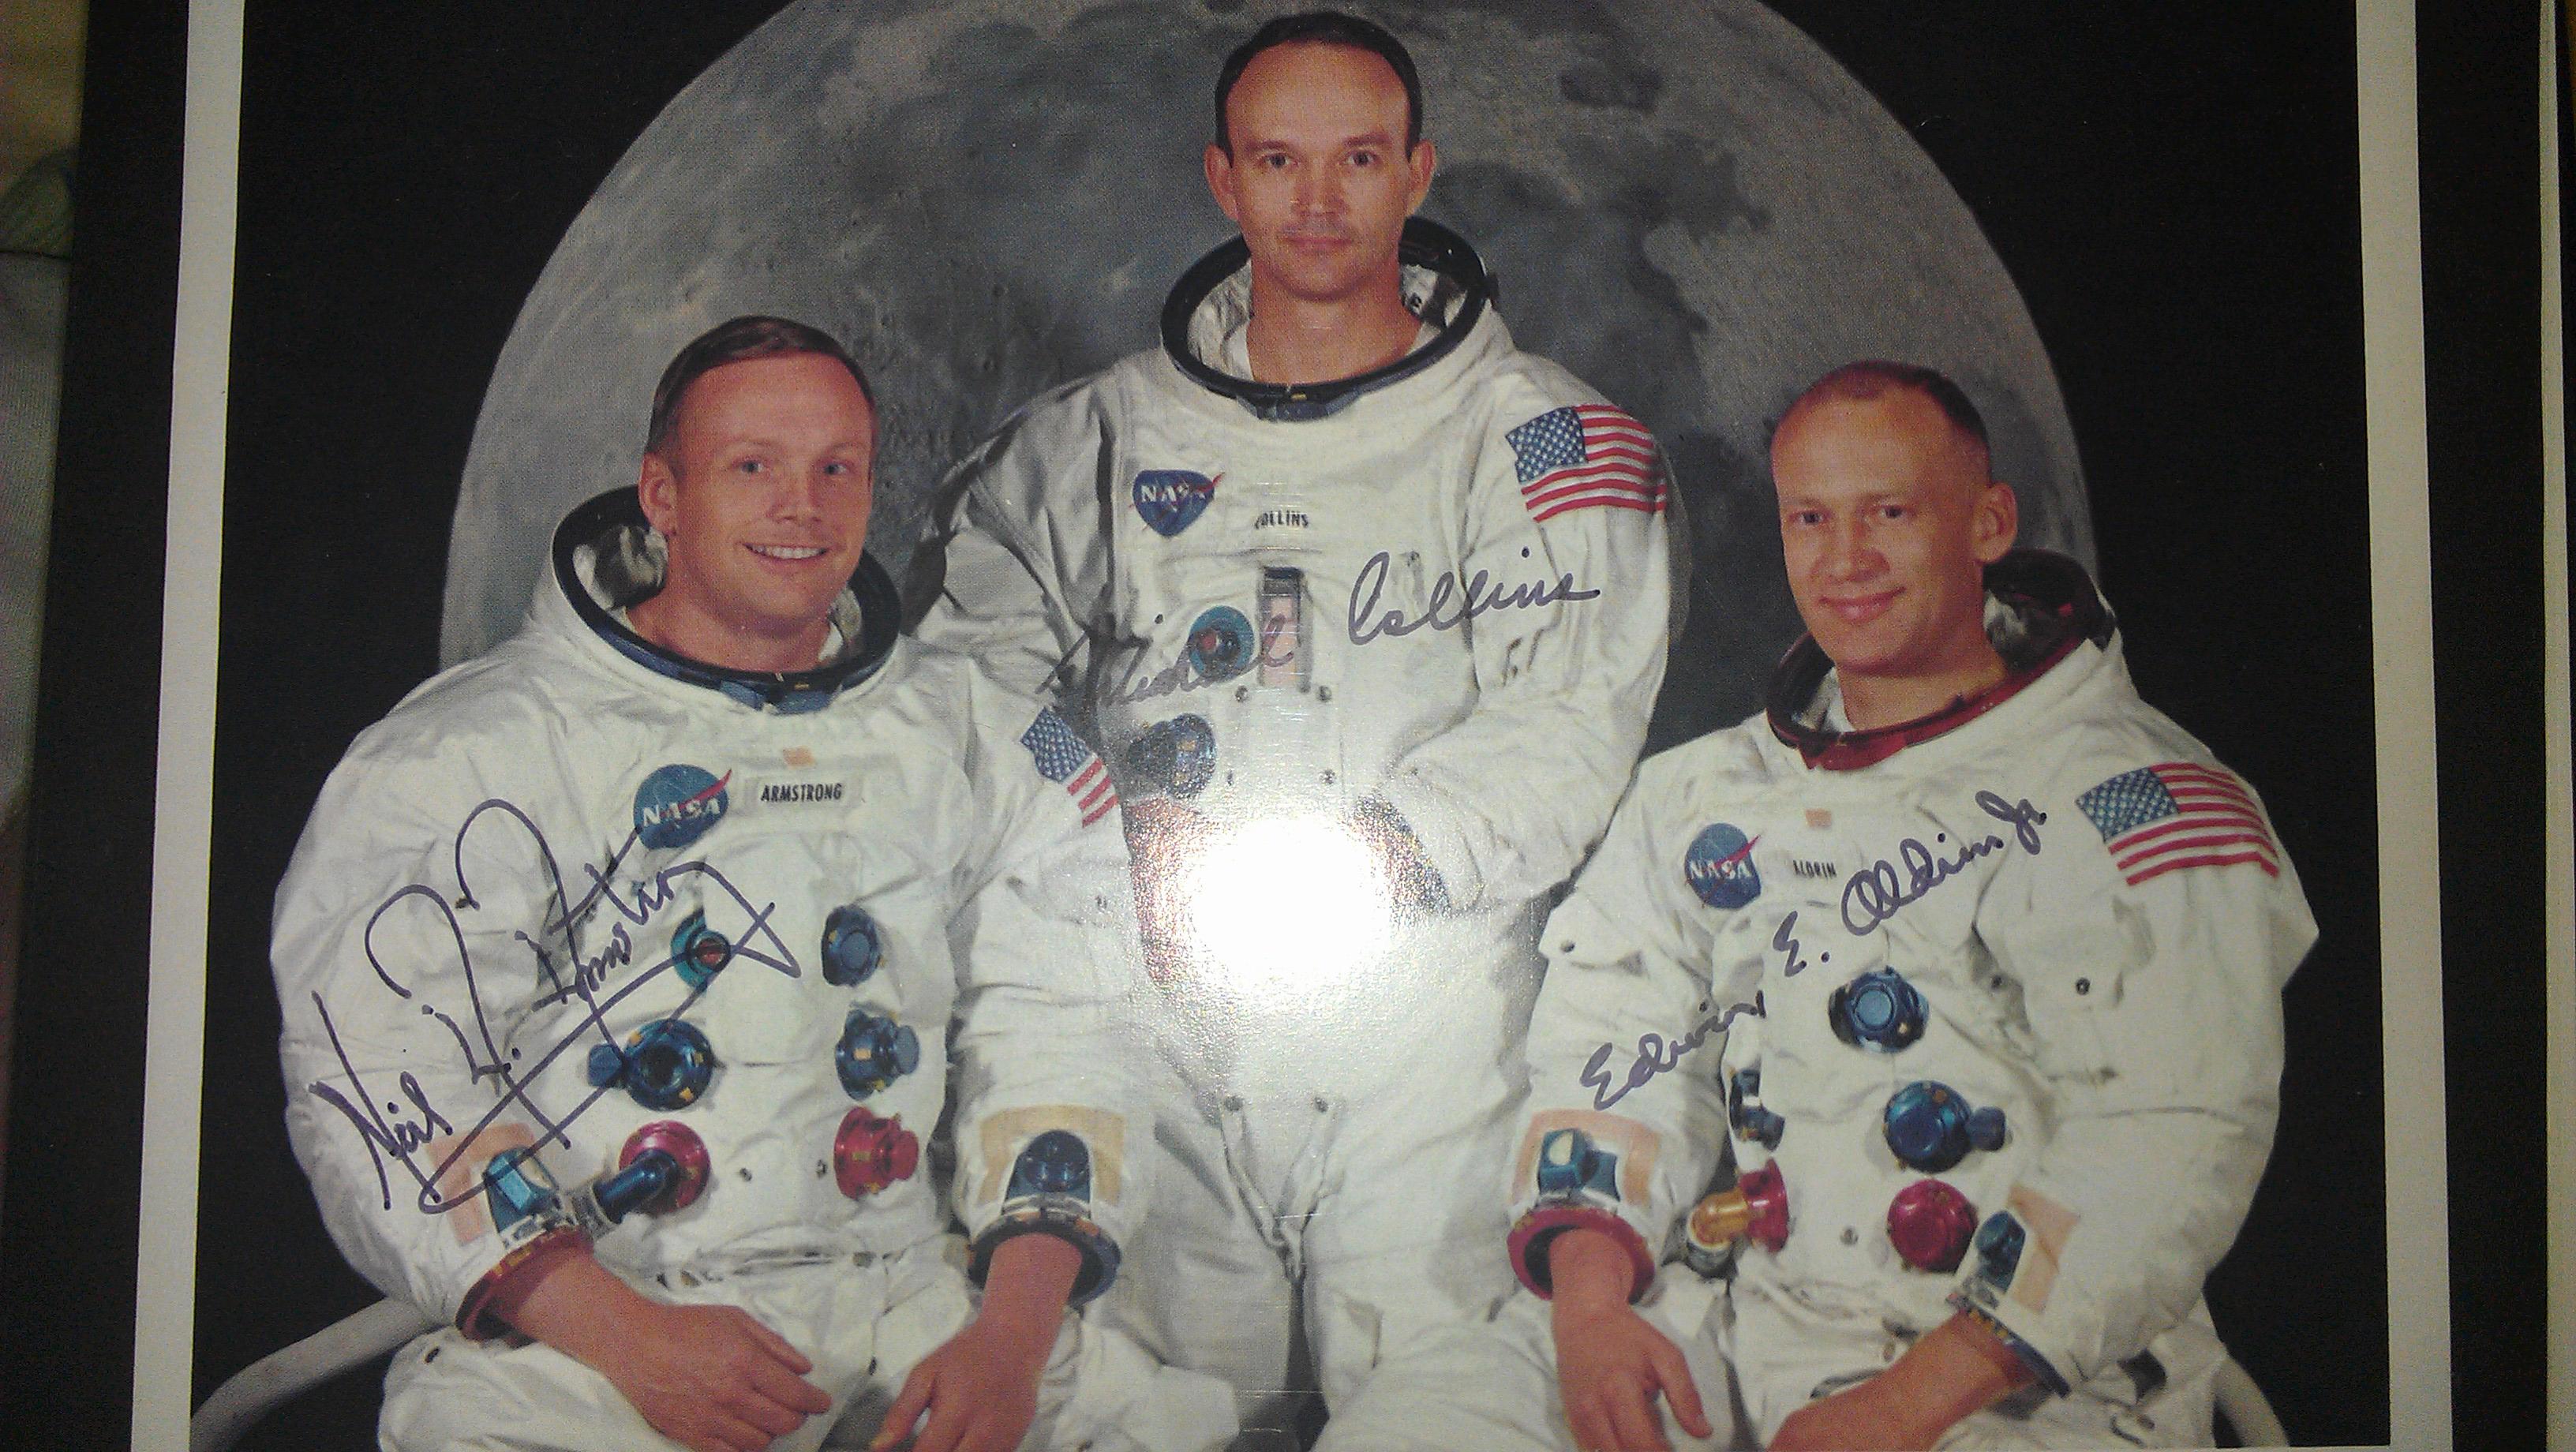 Authenticating an Apollo 11 autograph photo - collectSPACE ...